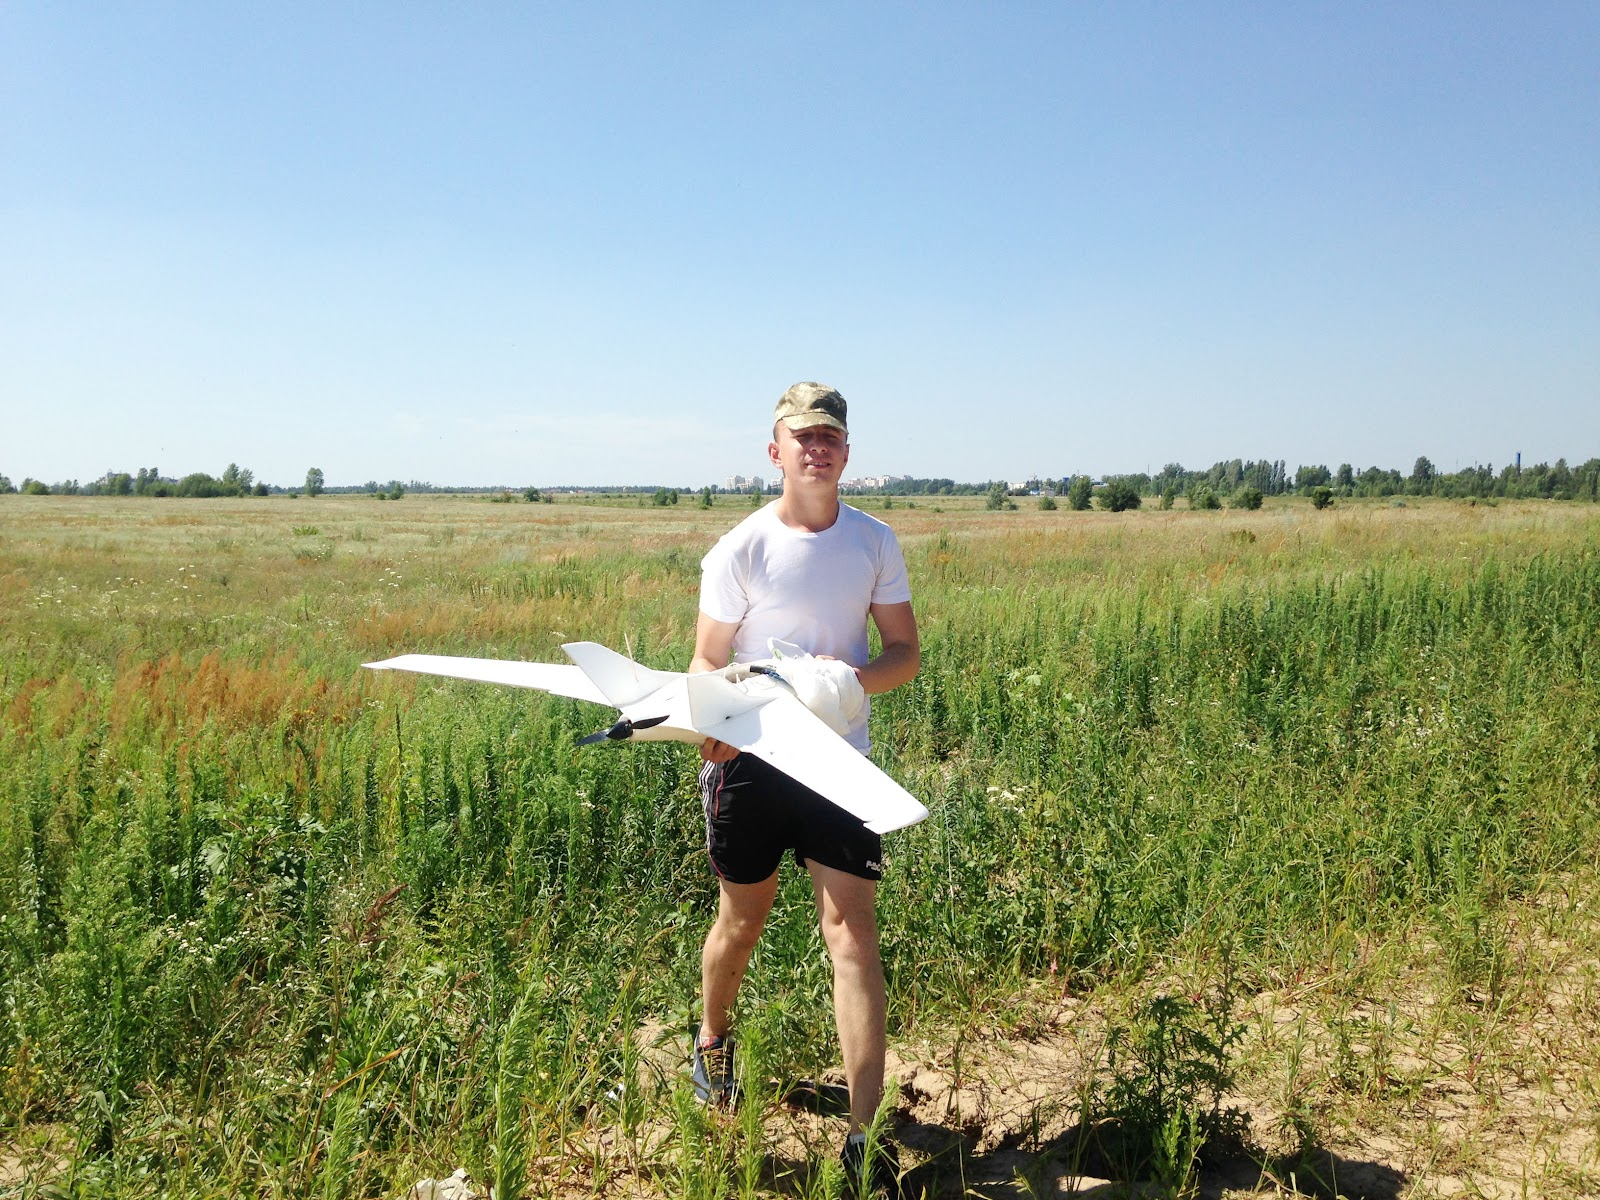 A soldier at the training center retrieves a UAV